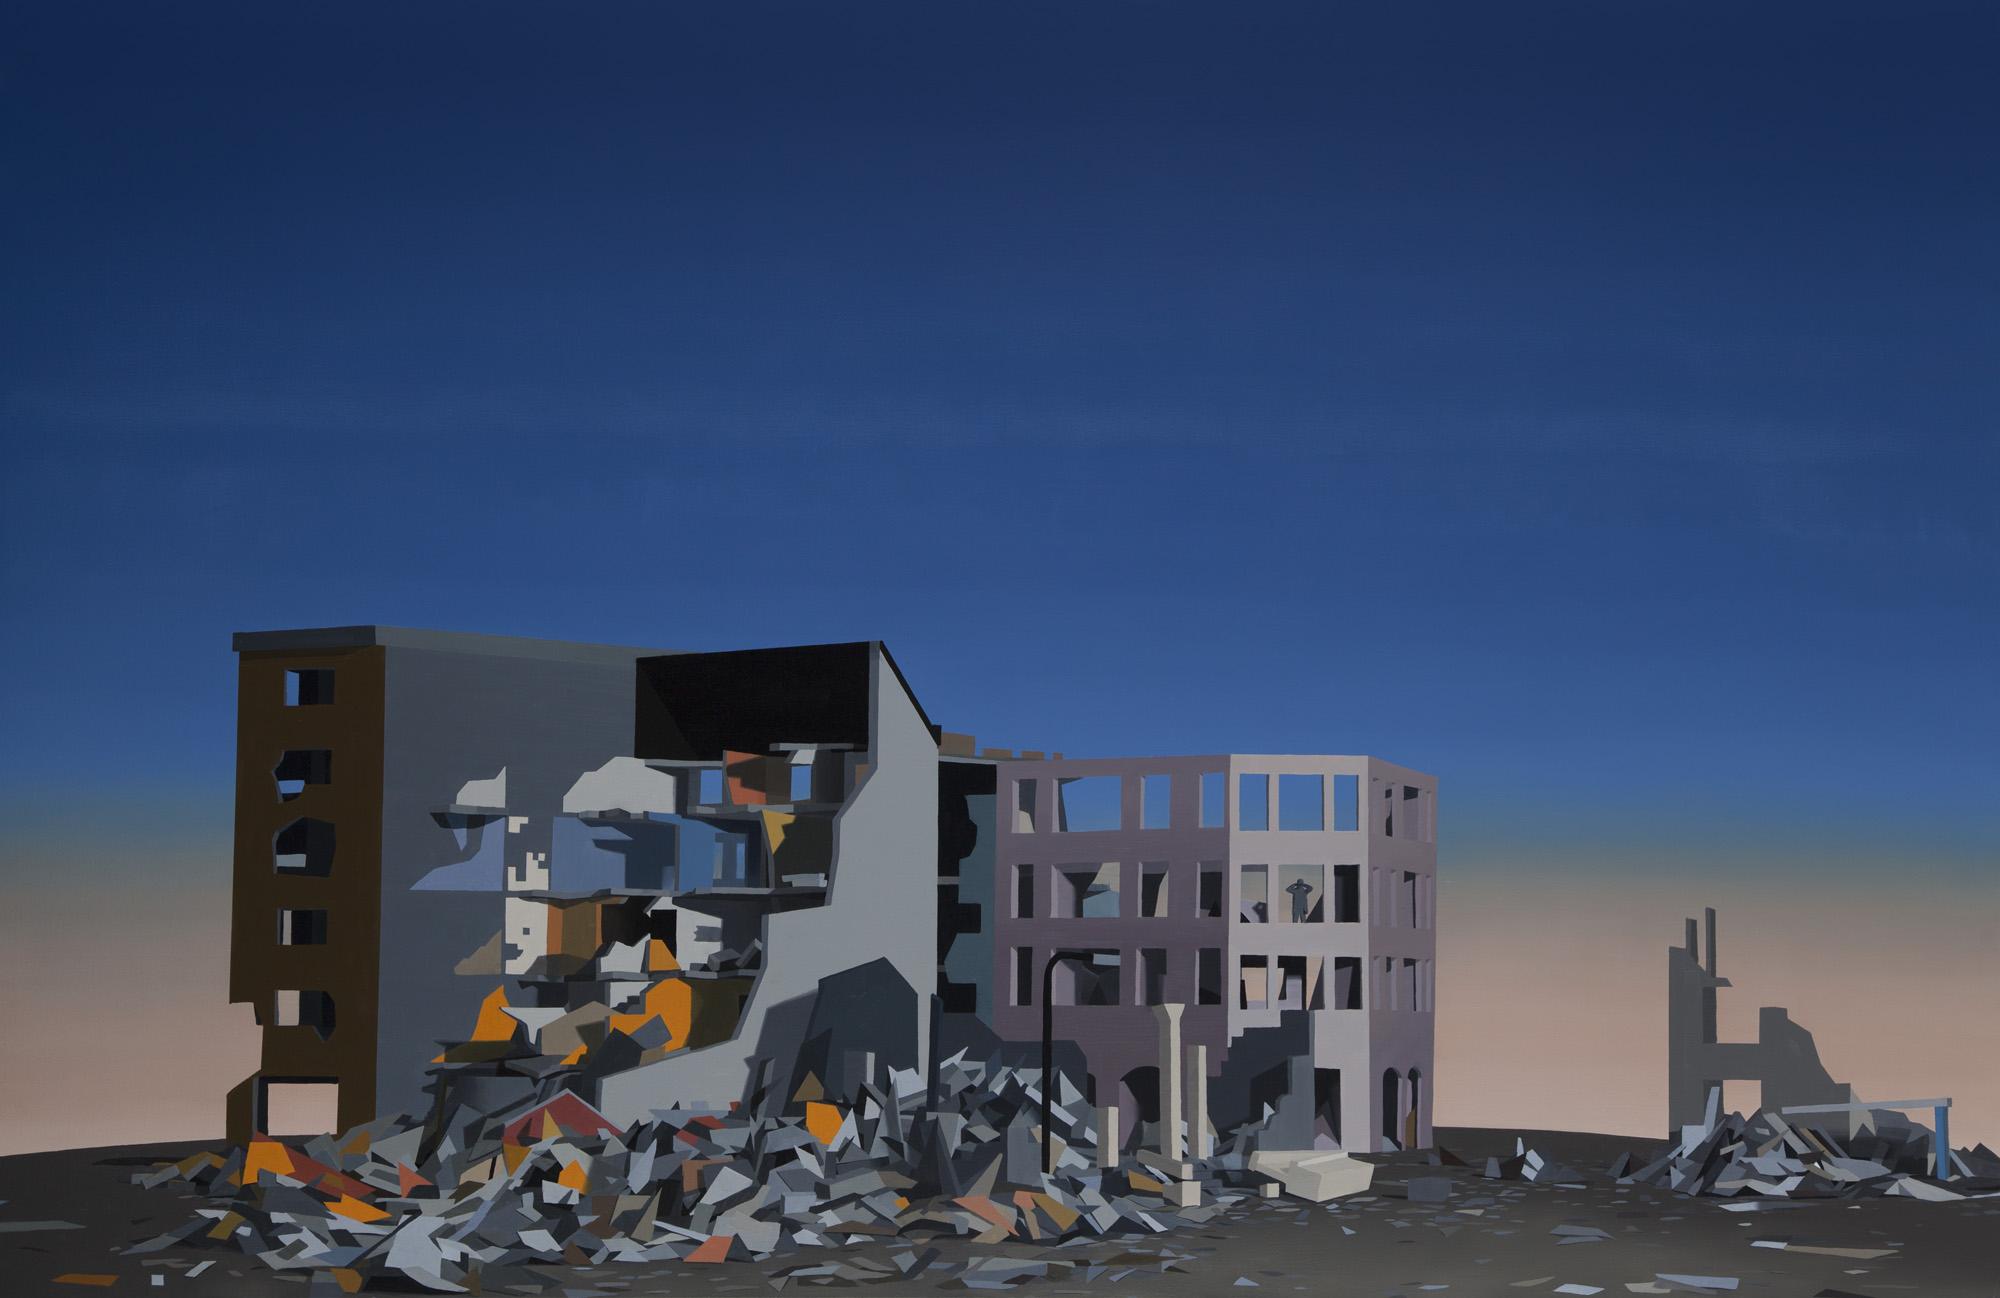 Fall - 2013 - oil on canvas - 160x250cm